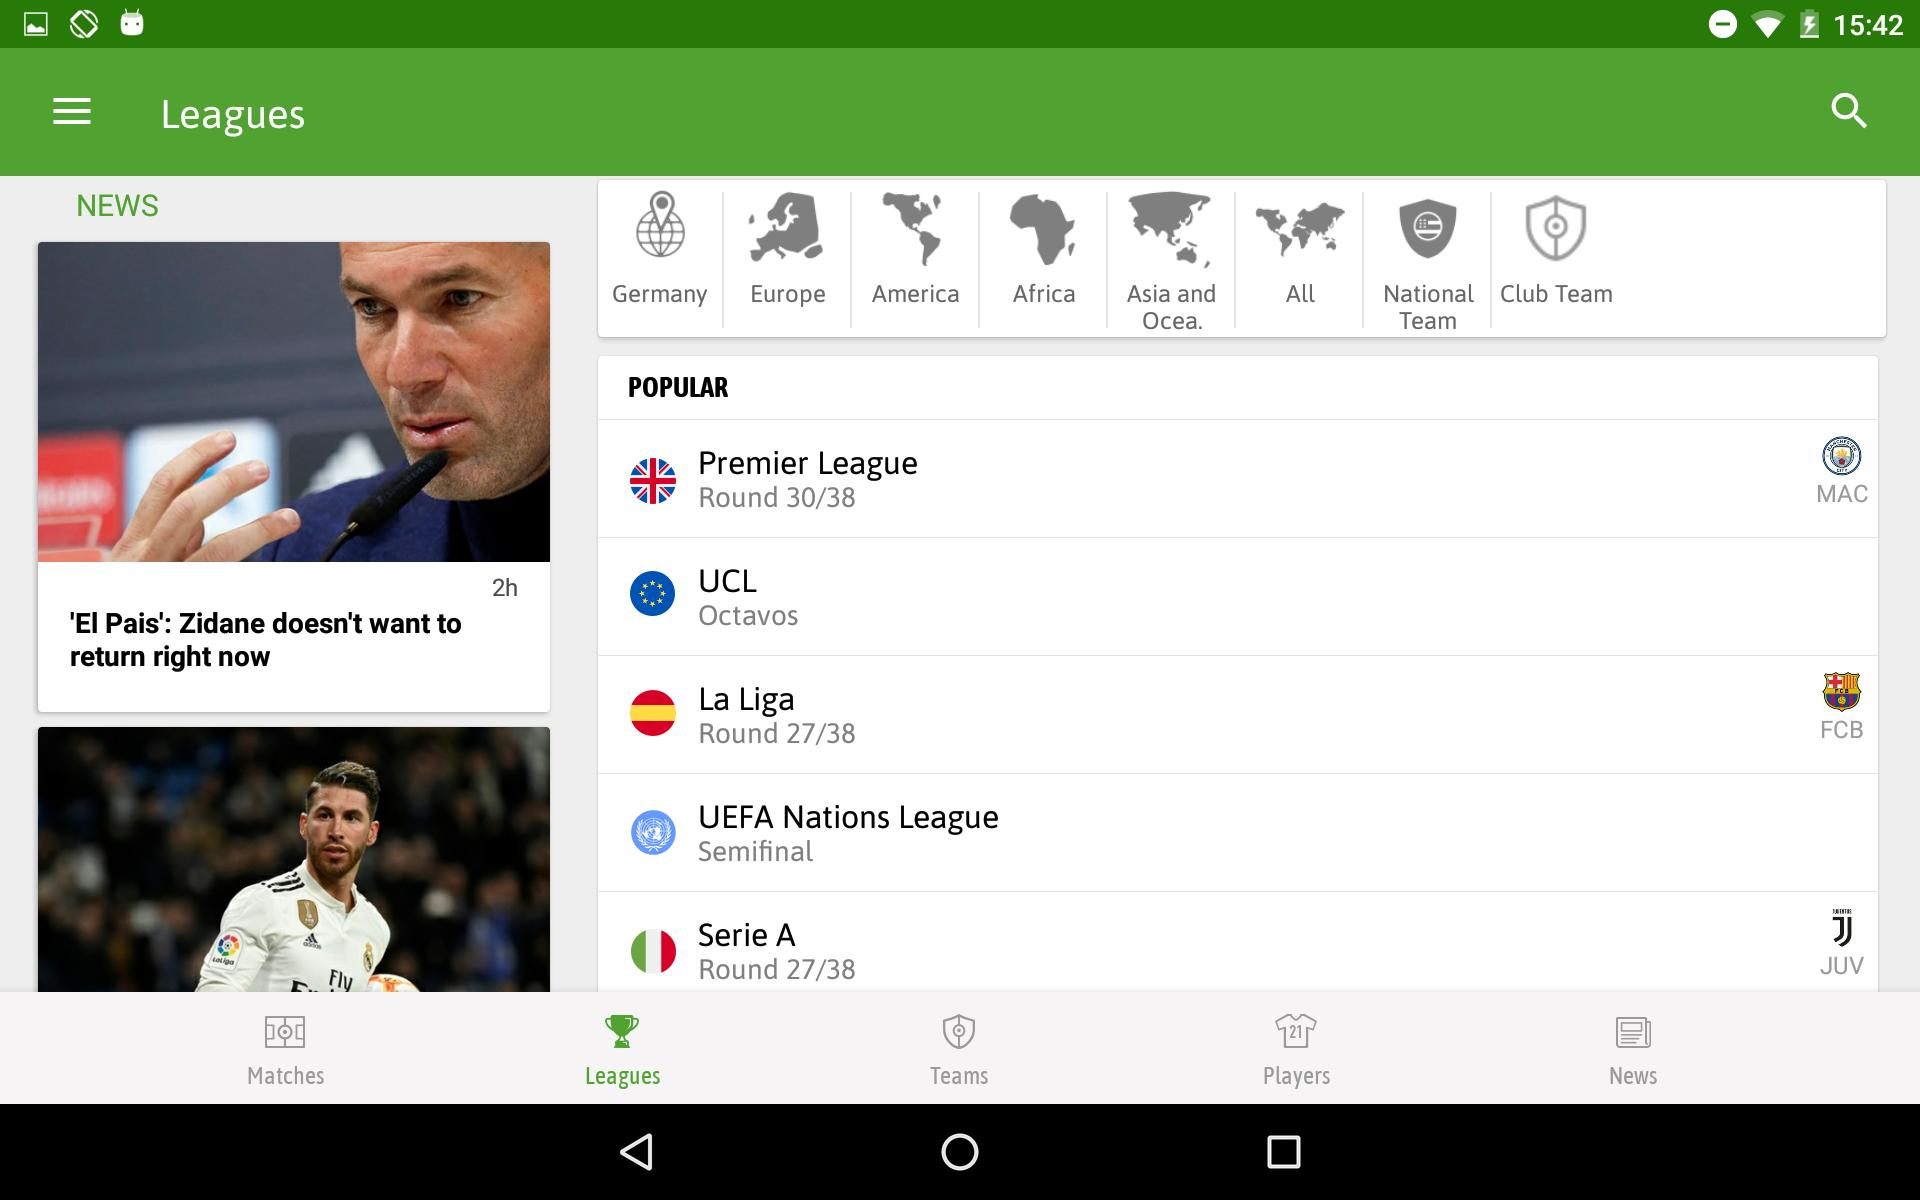 BeSoccer Soccer Live Score 5.1.1.4 Screenshot 14